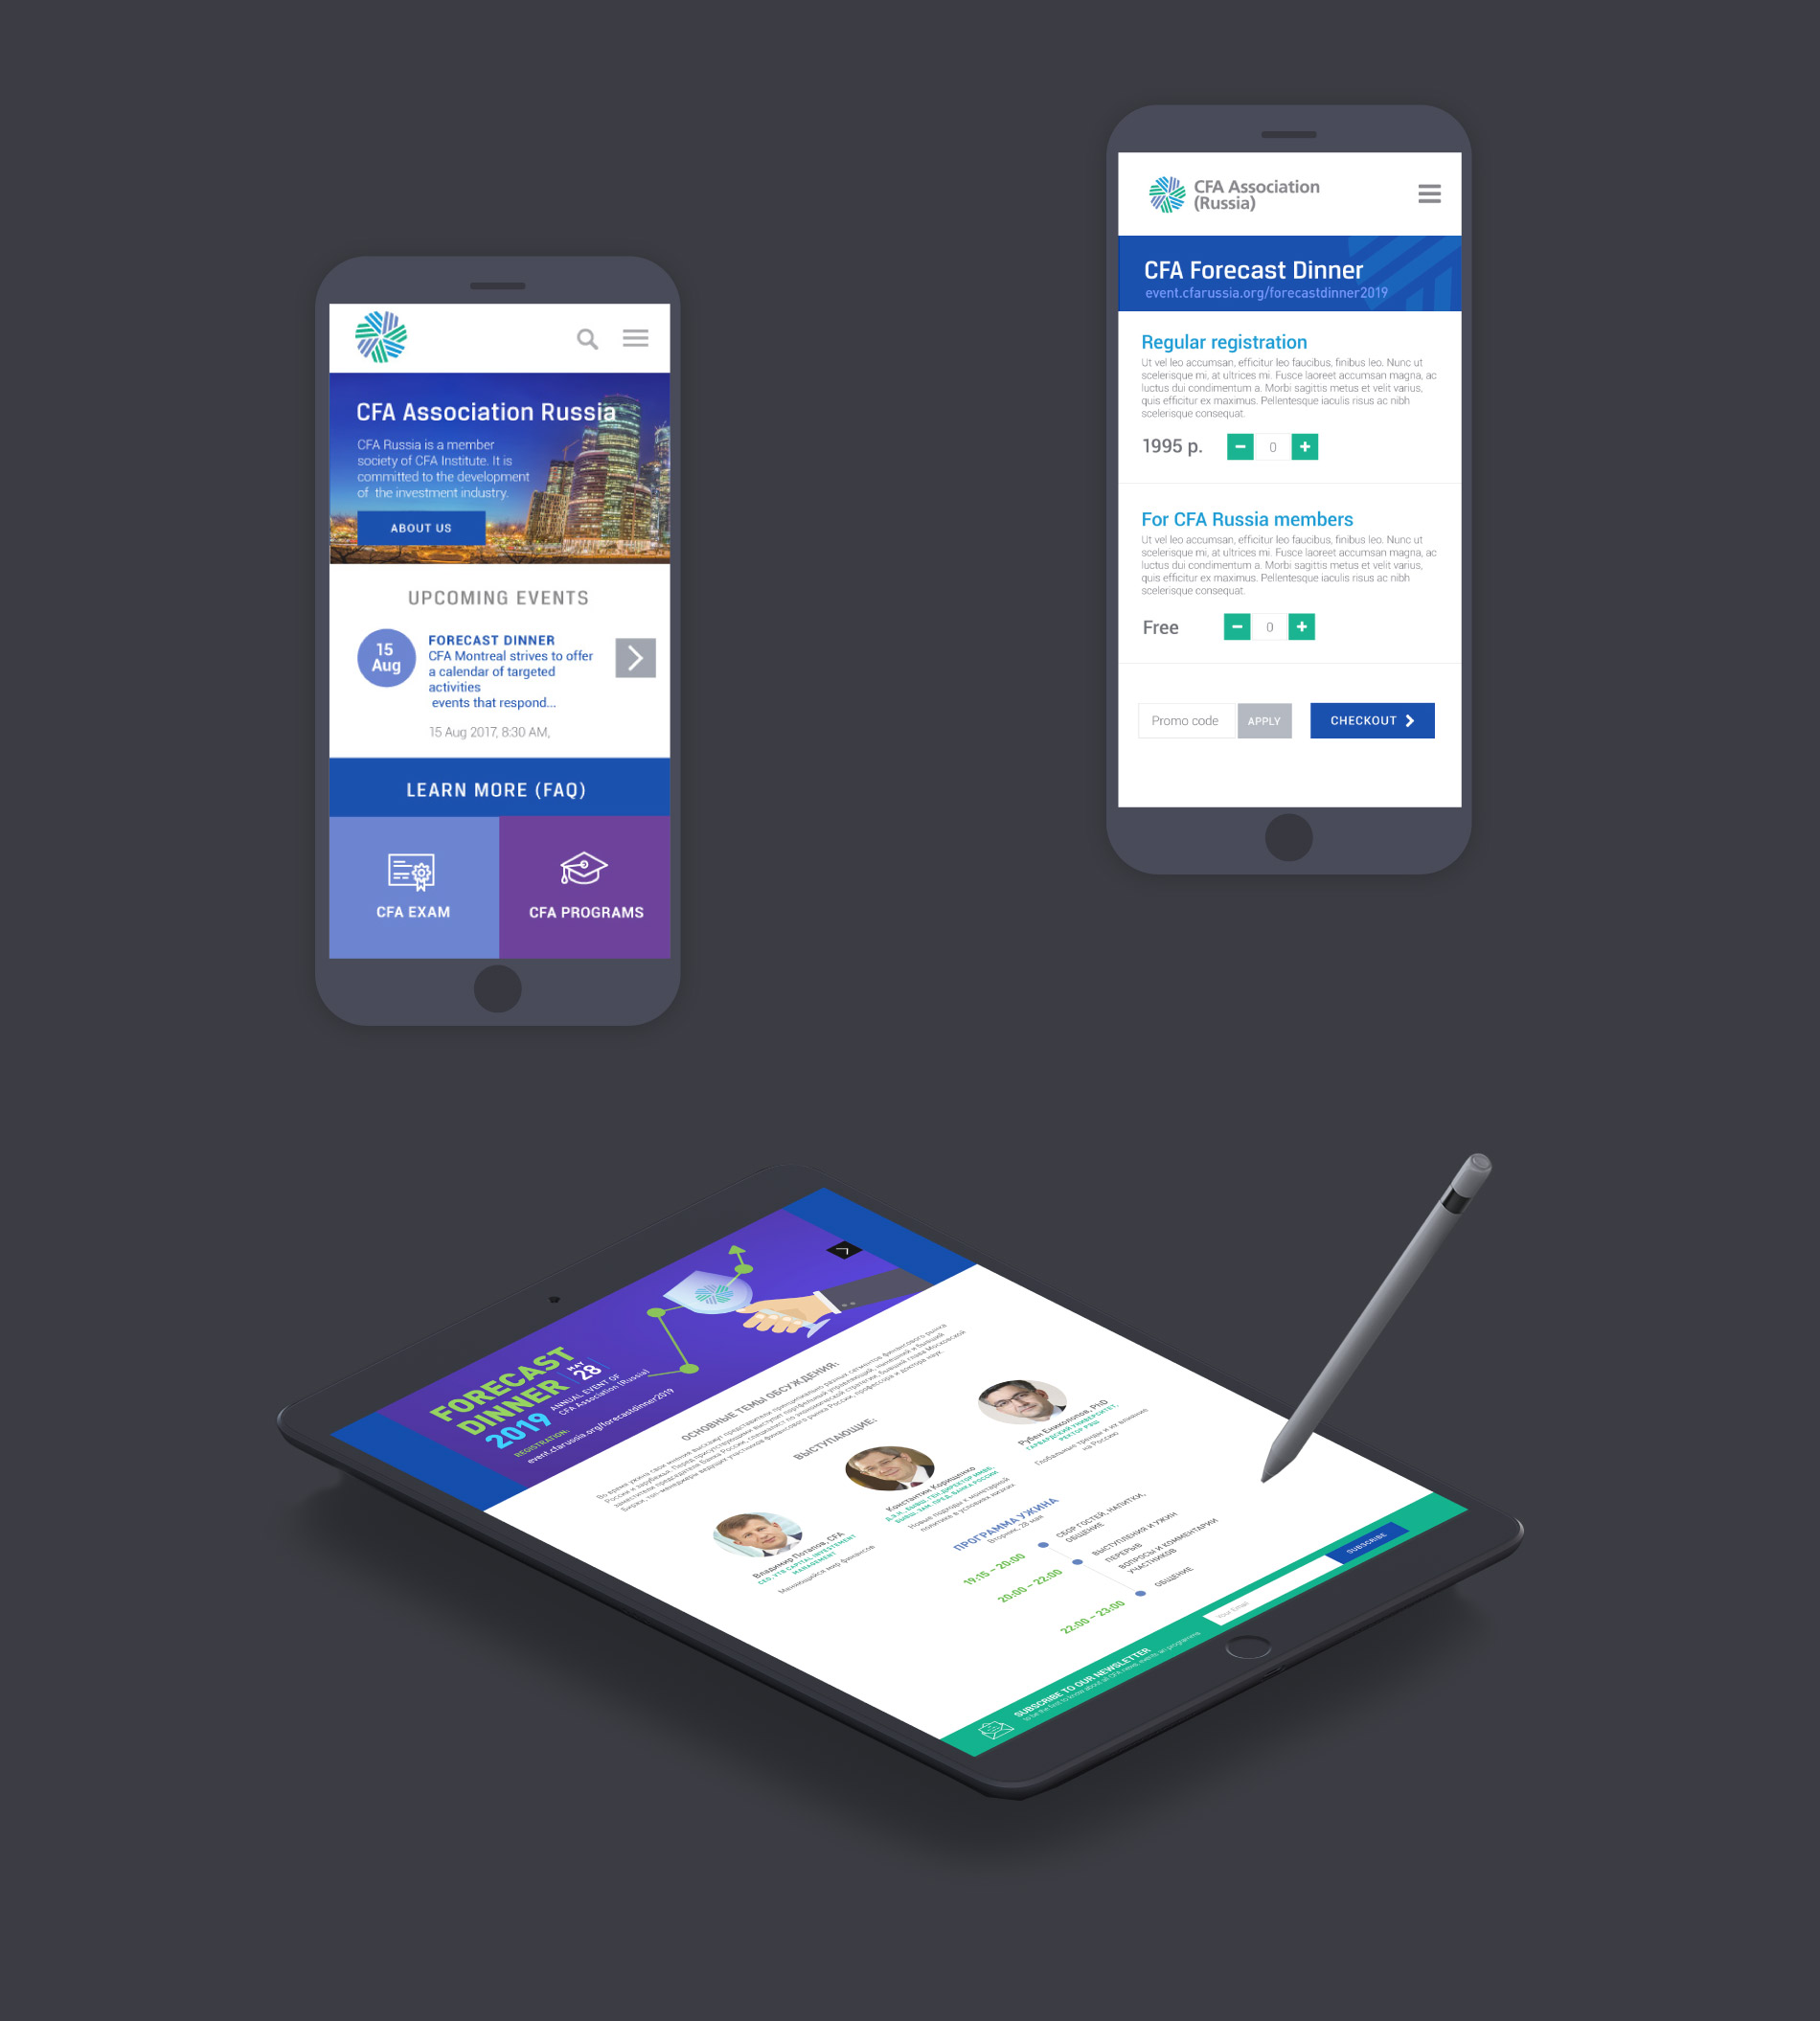 business association website design mobile (CFA)